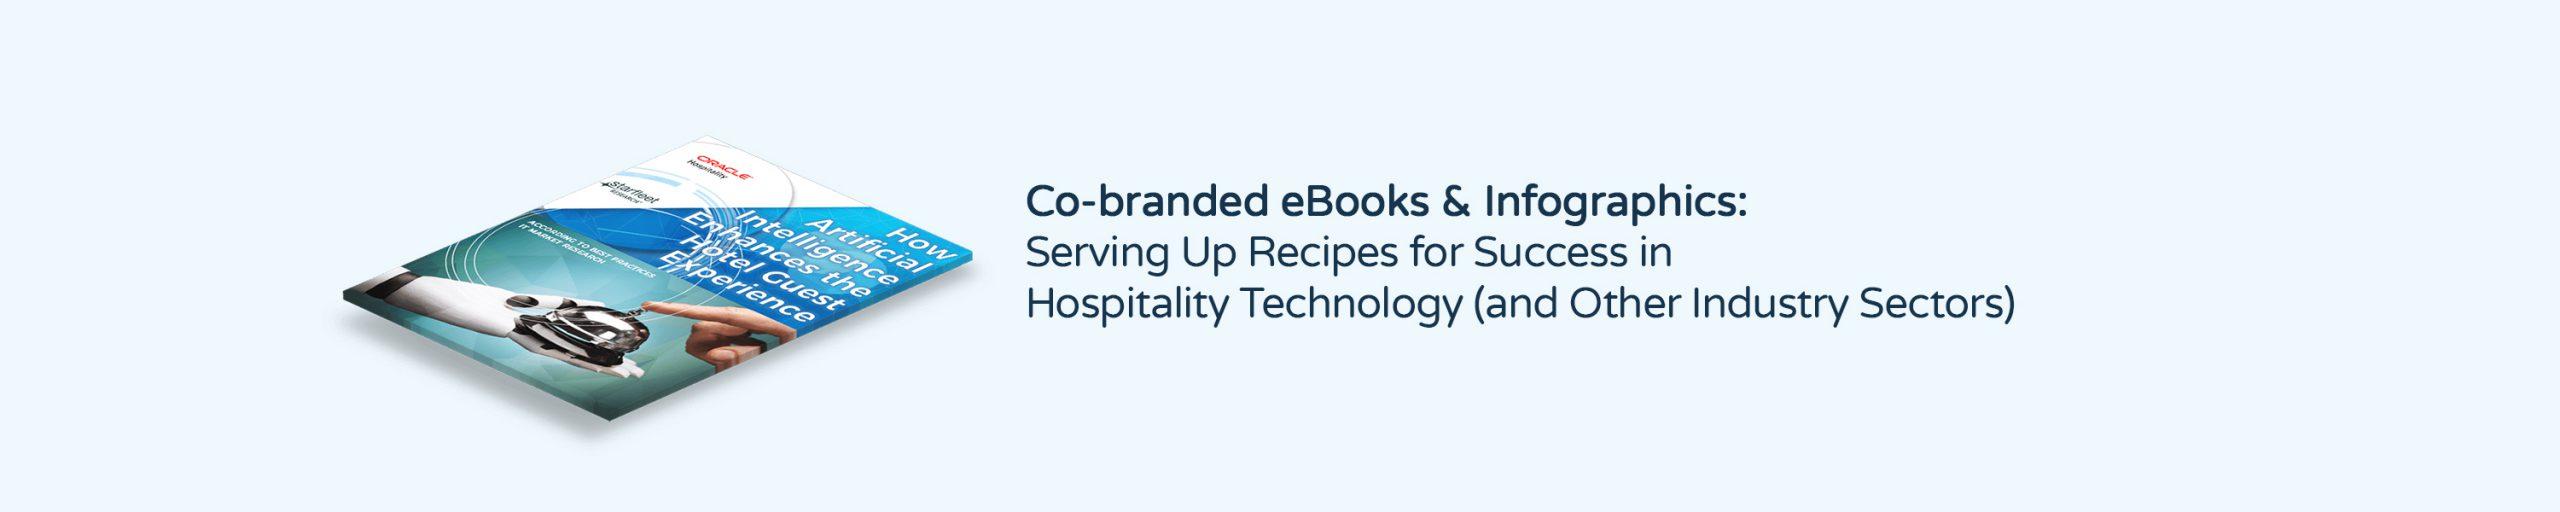 ebooks-Starfleet-Research-Carousel